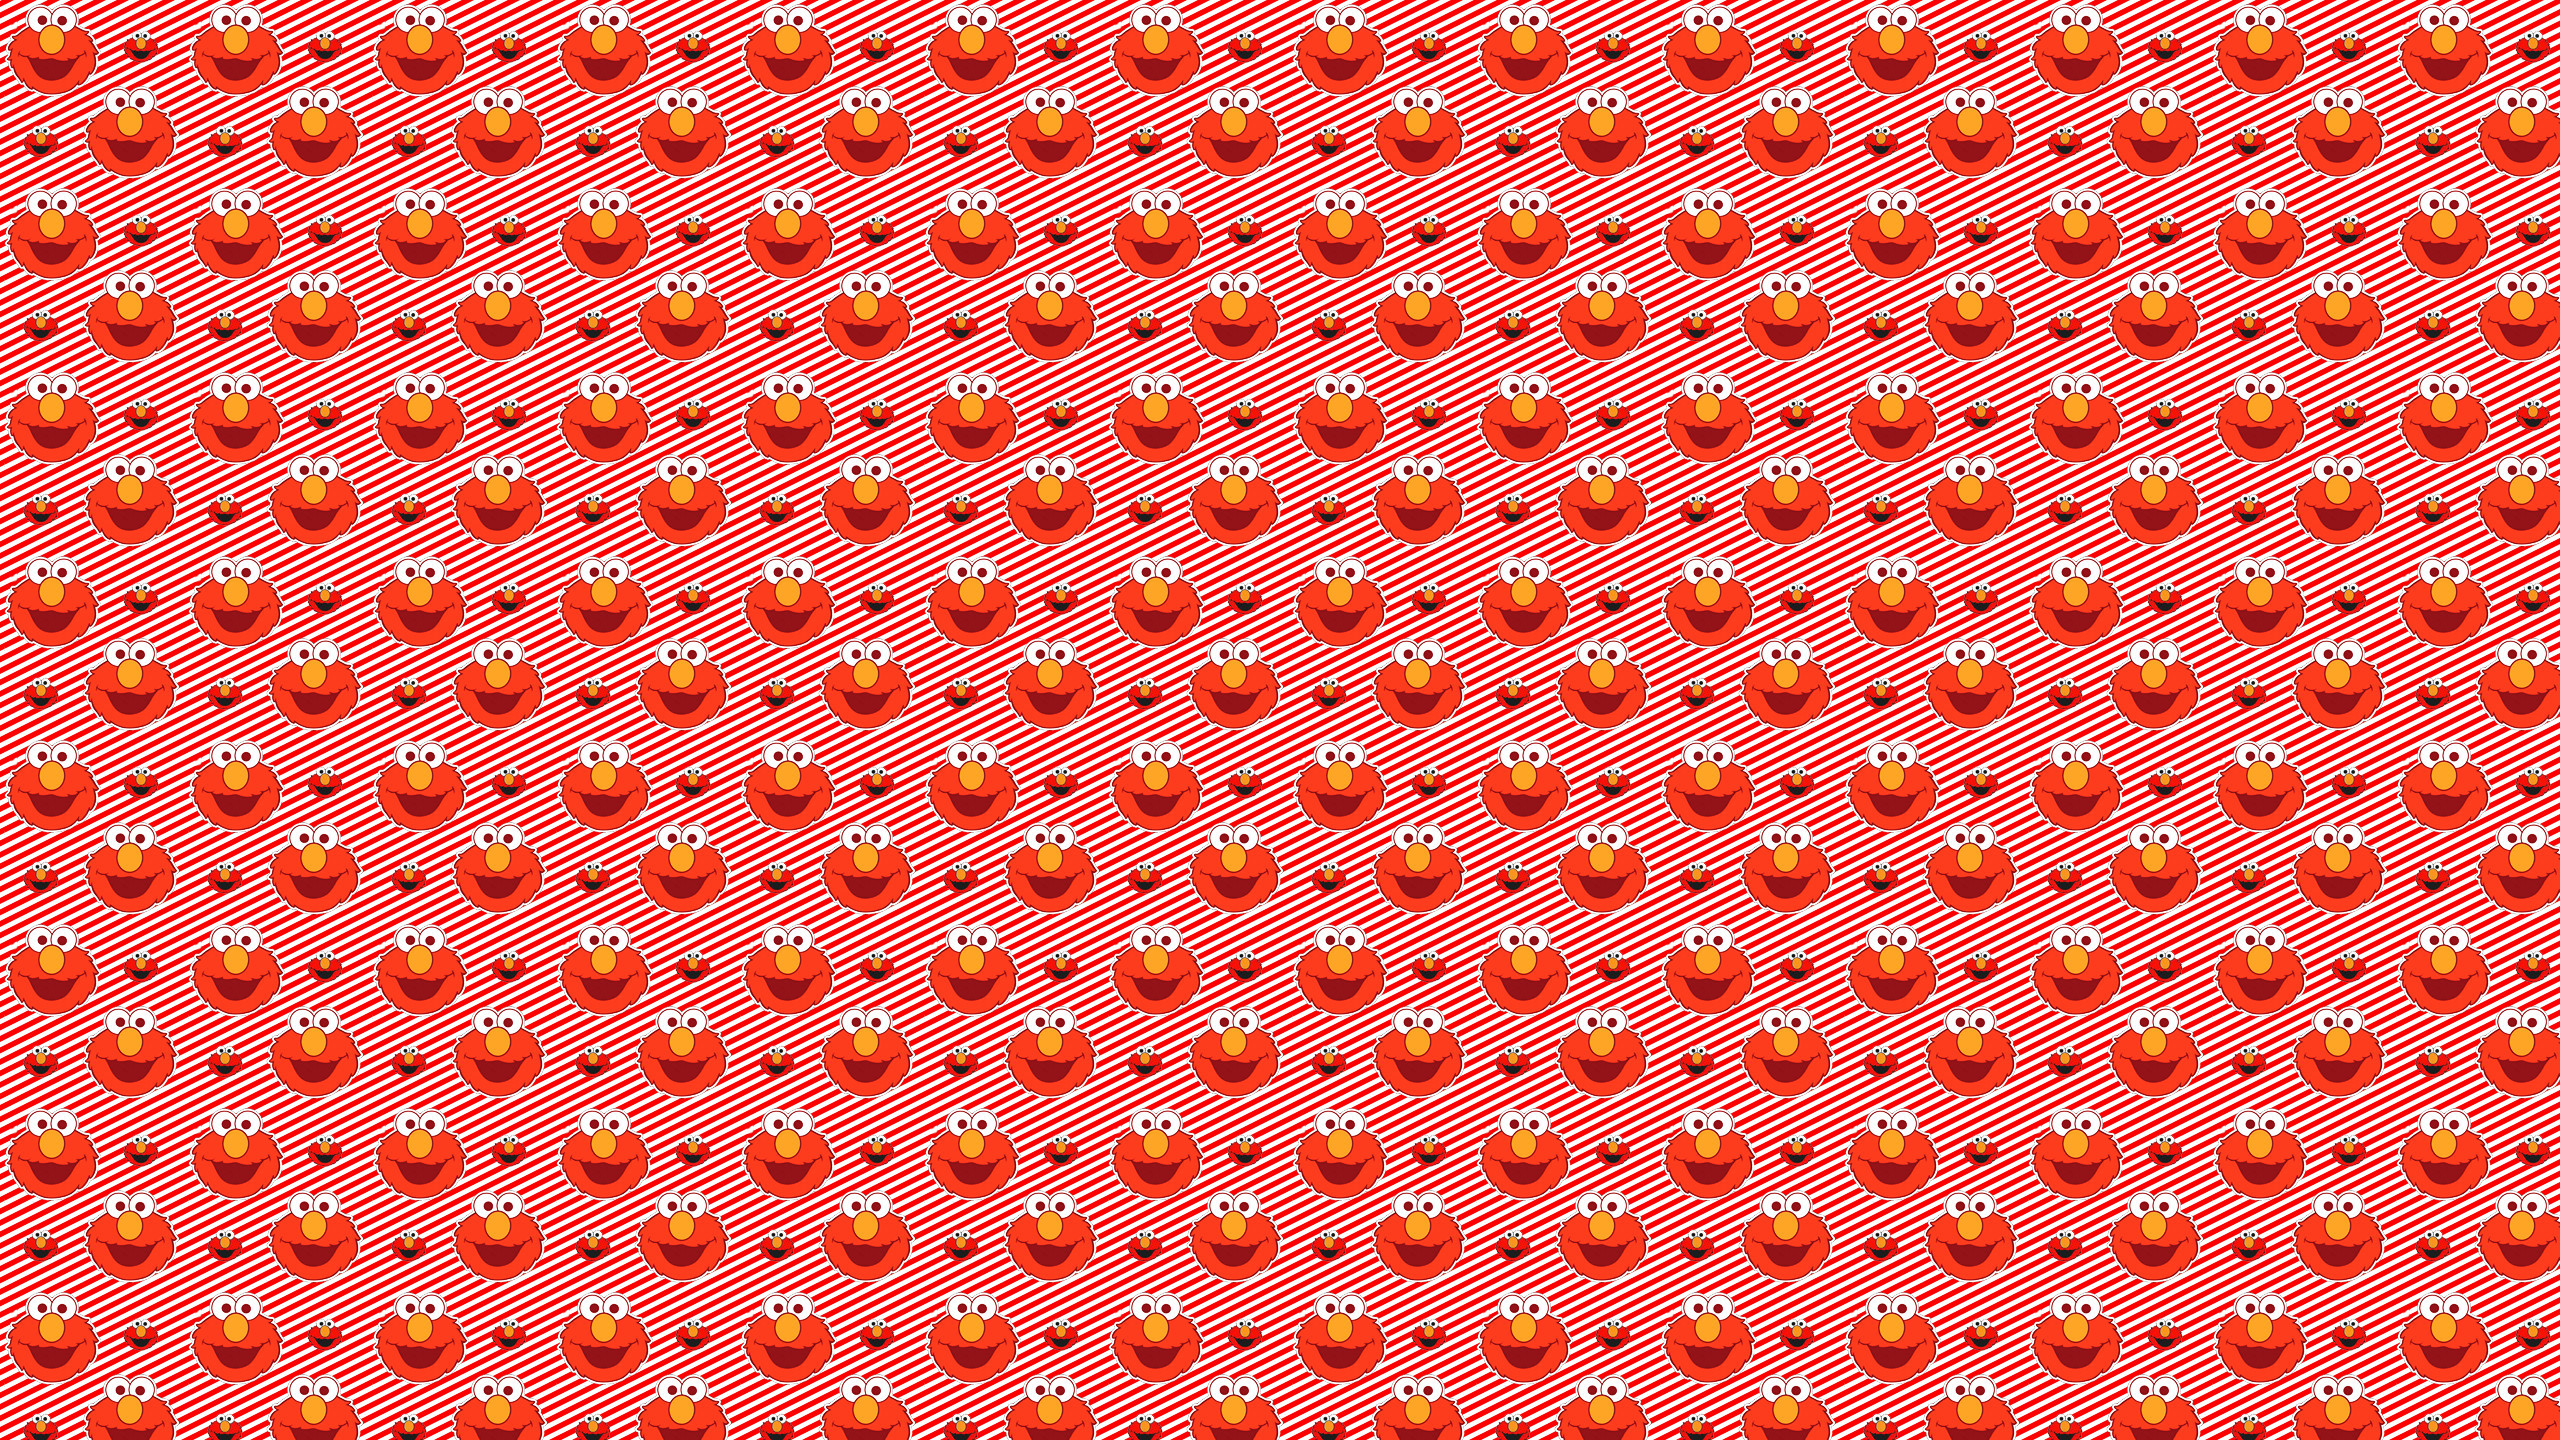 Elmo Wallpaper 56 images